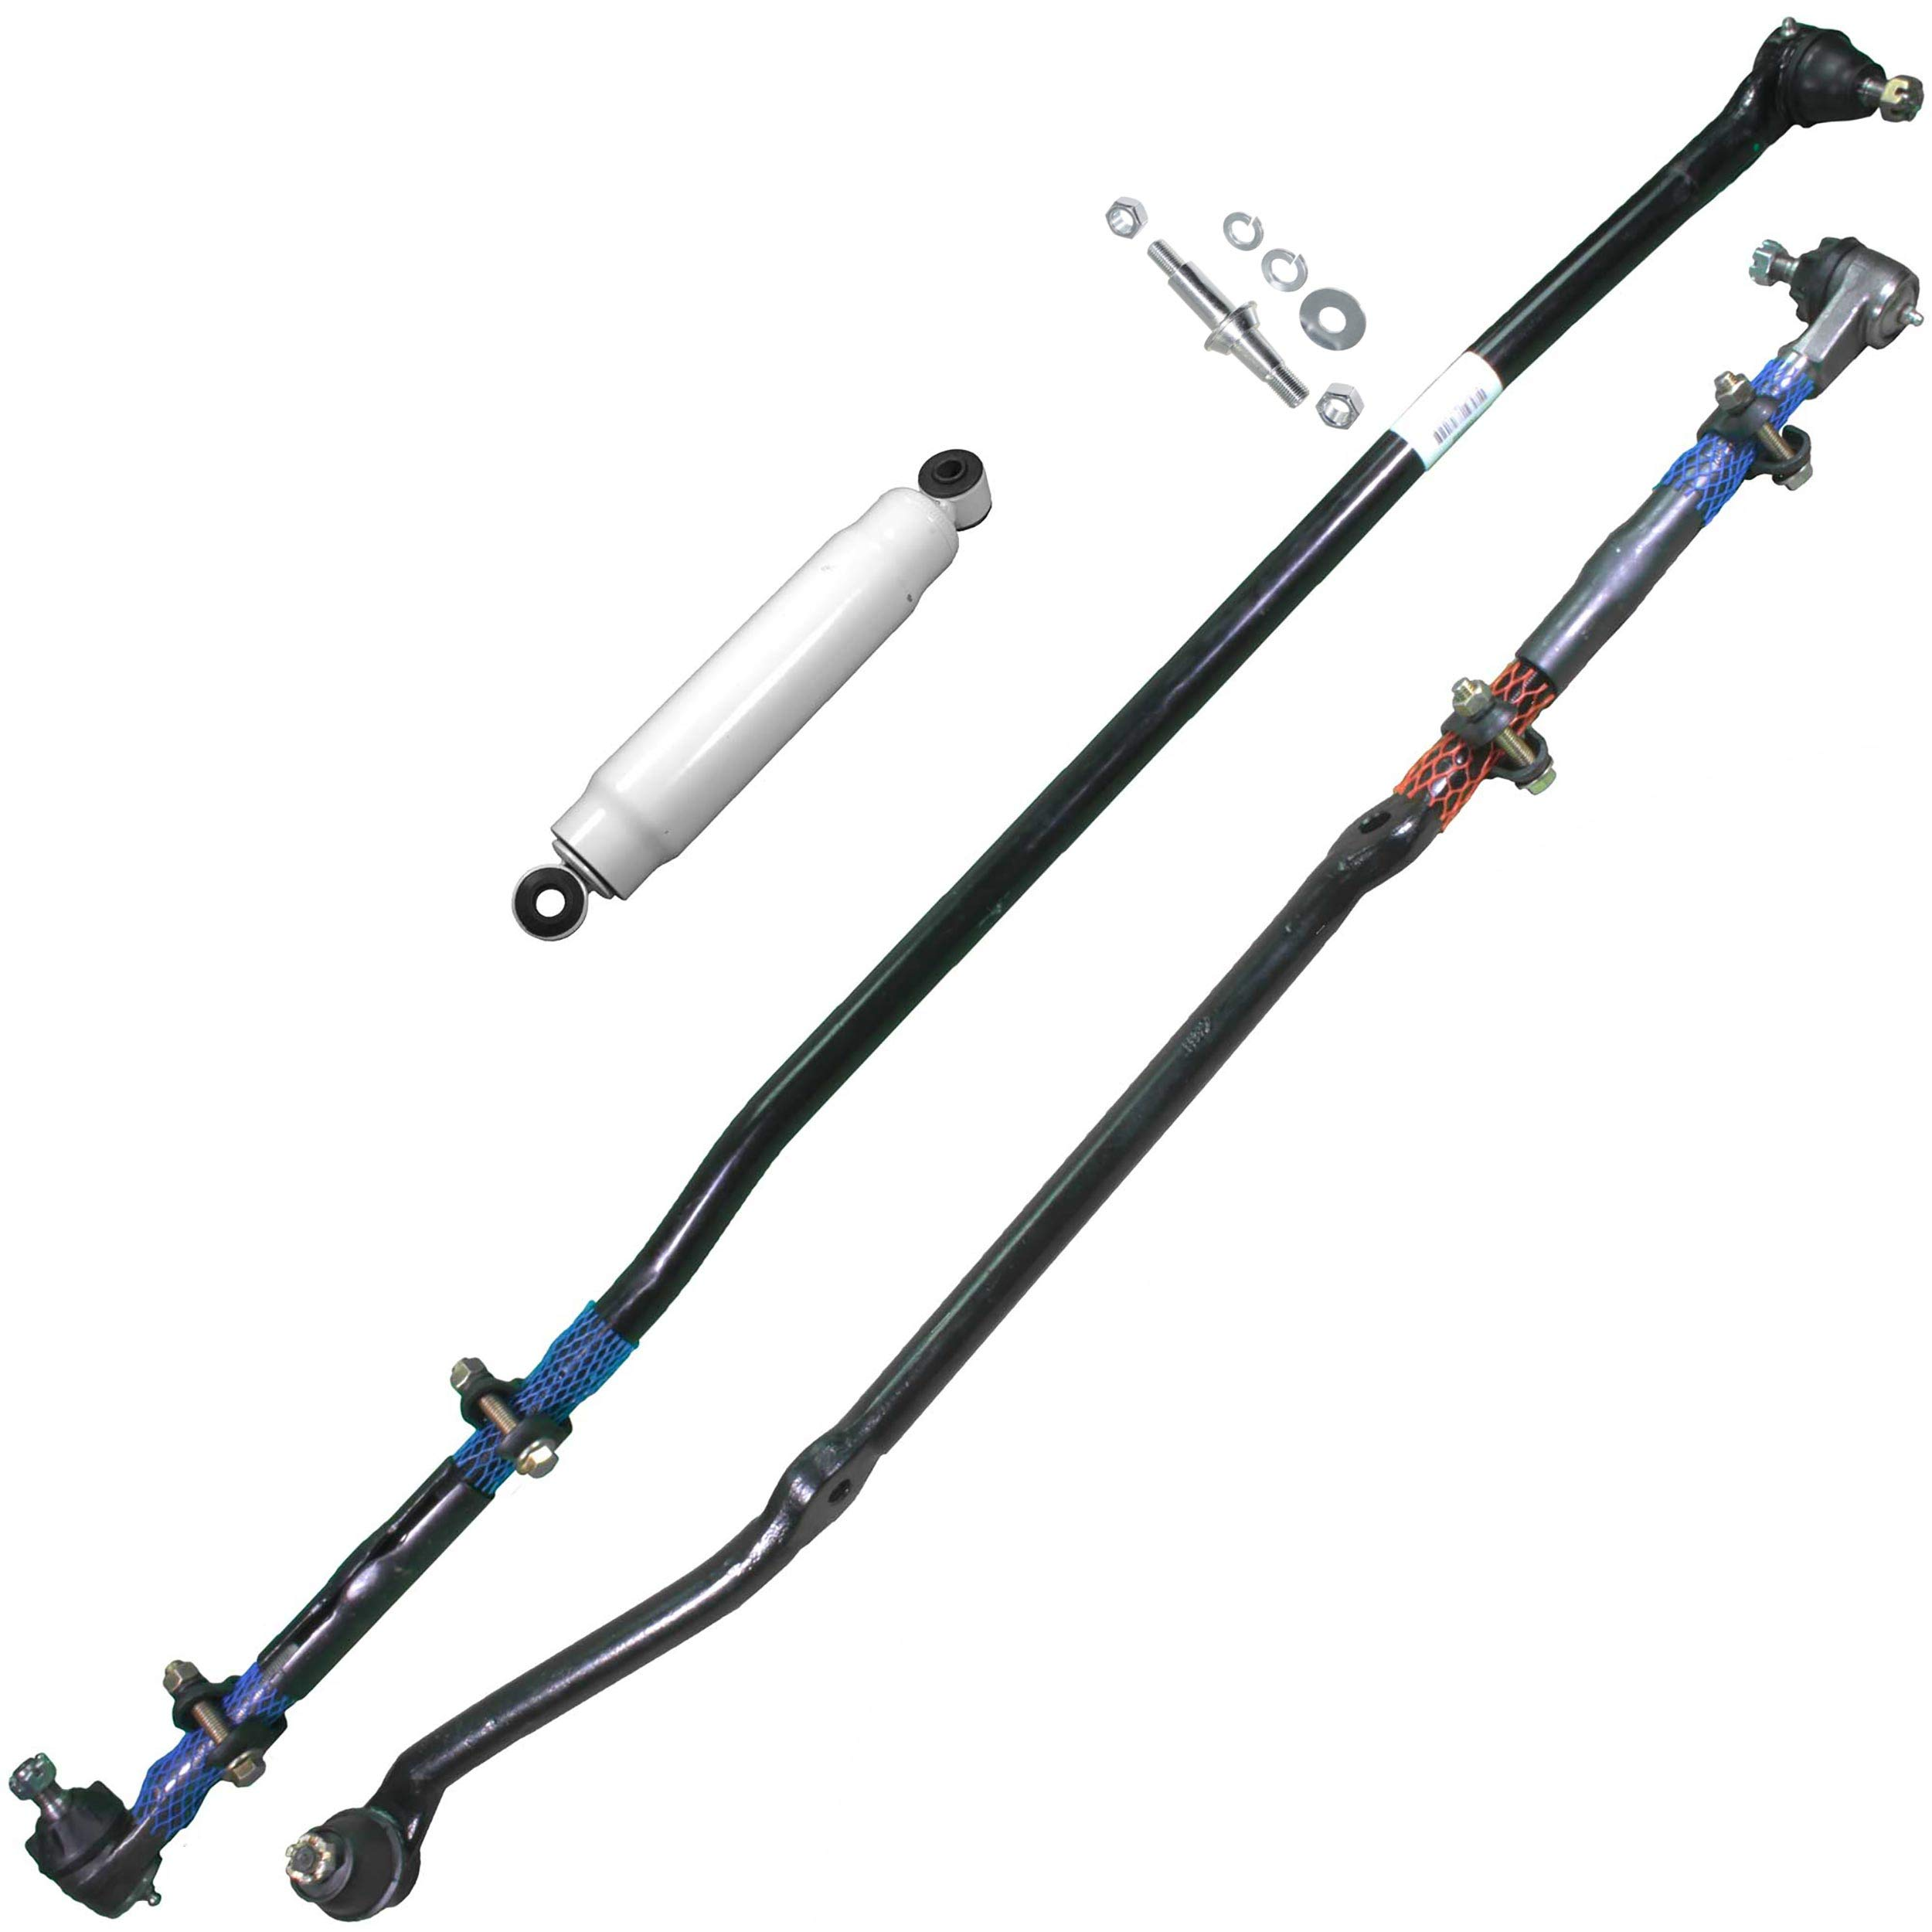 Apdty 108946 Tie Rod Drag Link Steering Stabilizer Hd Heavy Duty Upgrade 1997 2006 Jeep Wrangler 91 01 Cherokee 1991 1992 Comanche 93 98 Grand